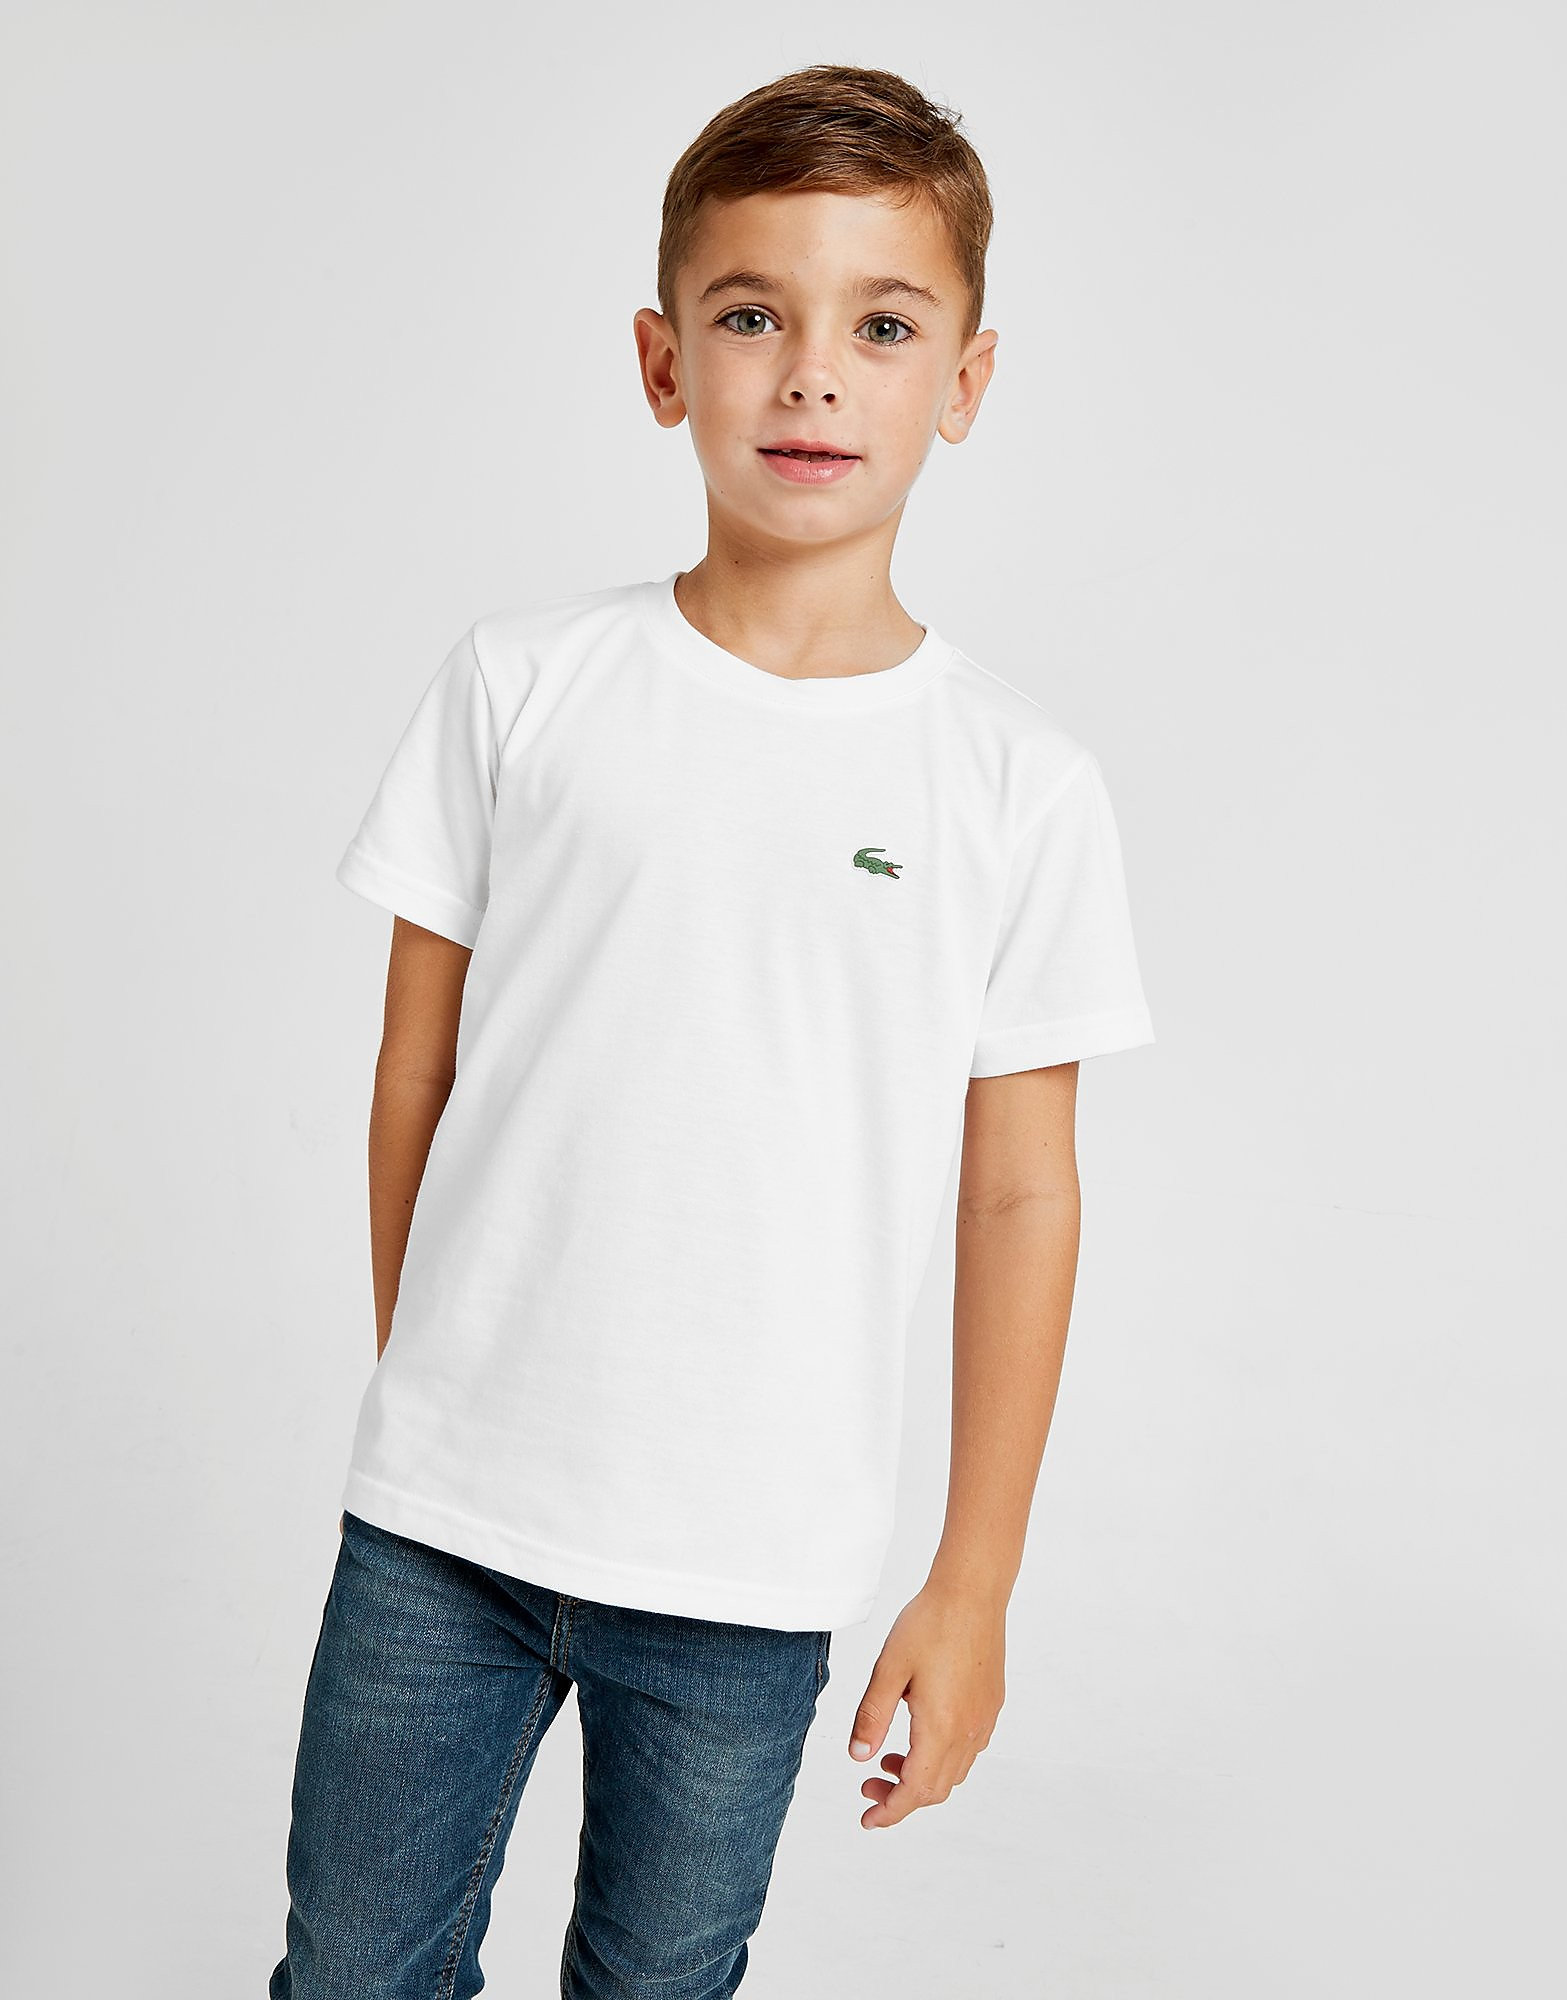 Lacoste Small Logo T-Shirt Children's